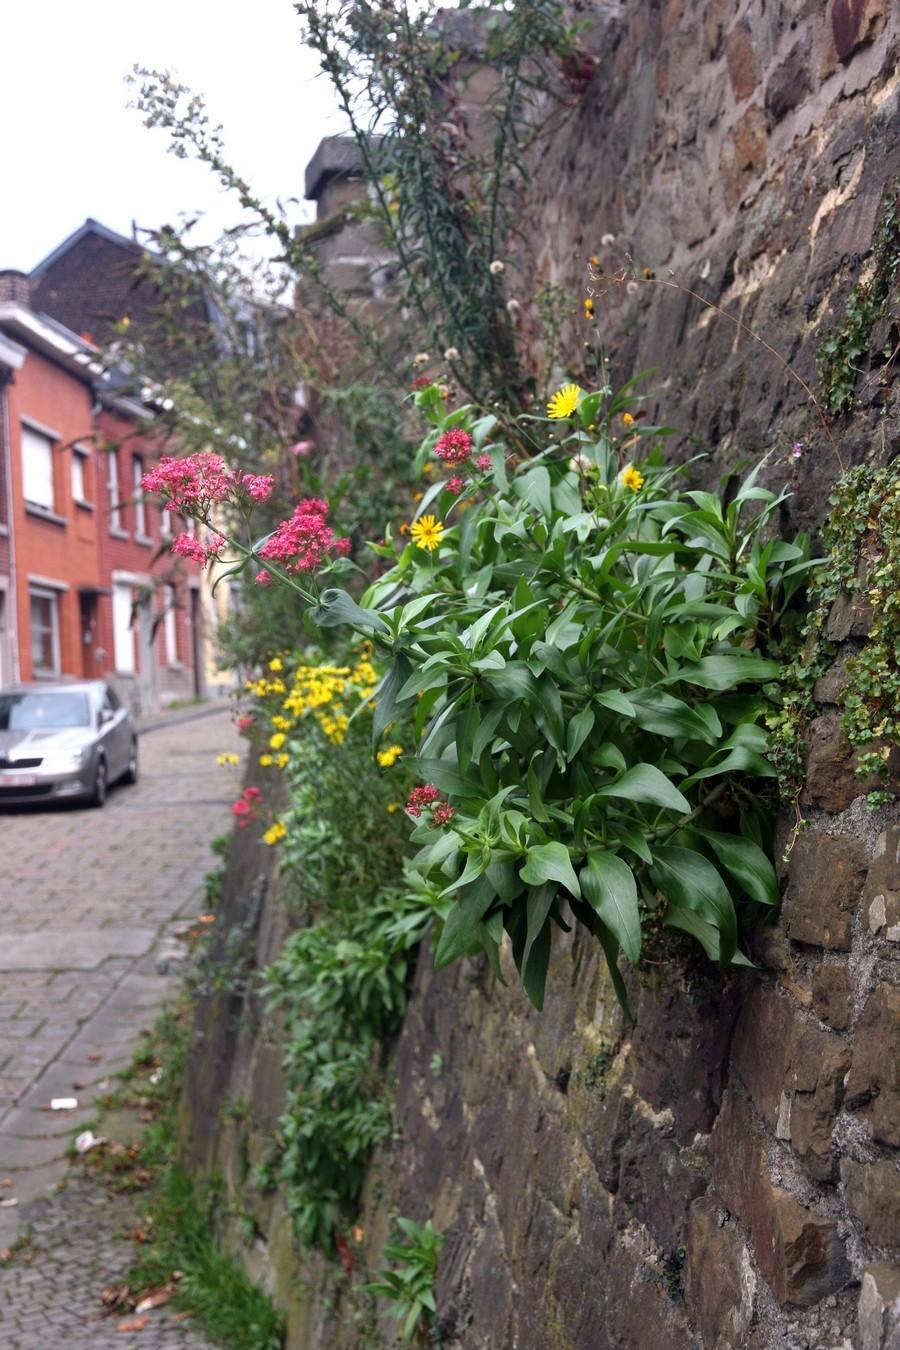 Gt maillage vert urbagora asbl for Emploi responsable espaces verts